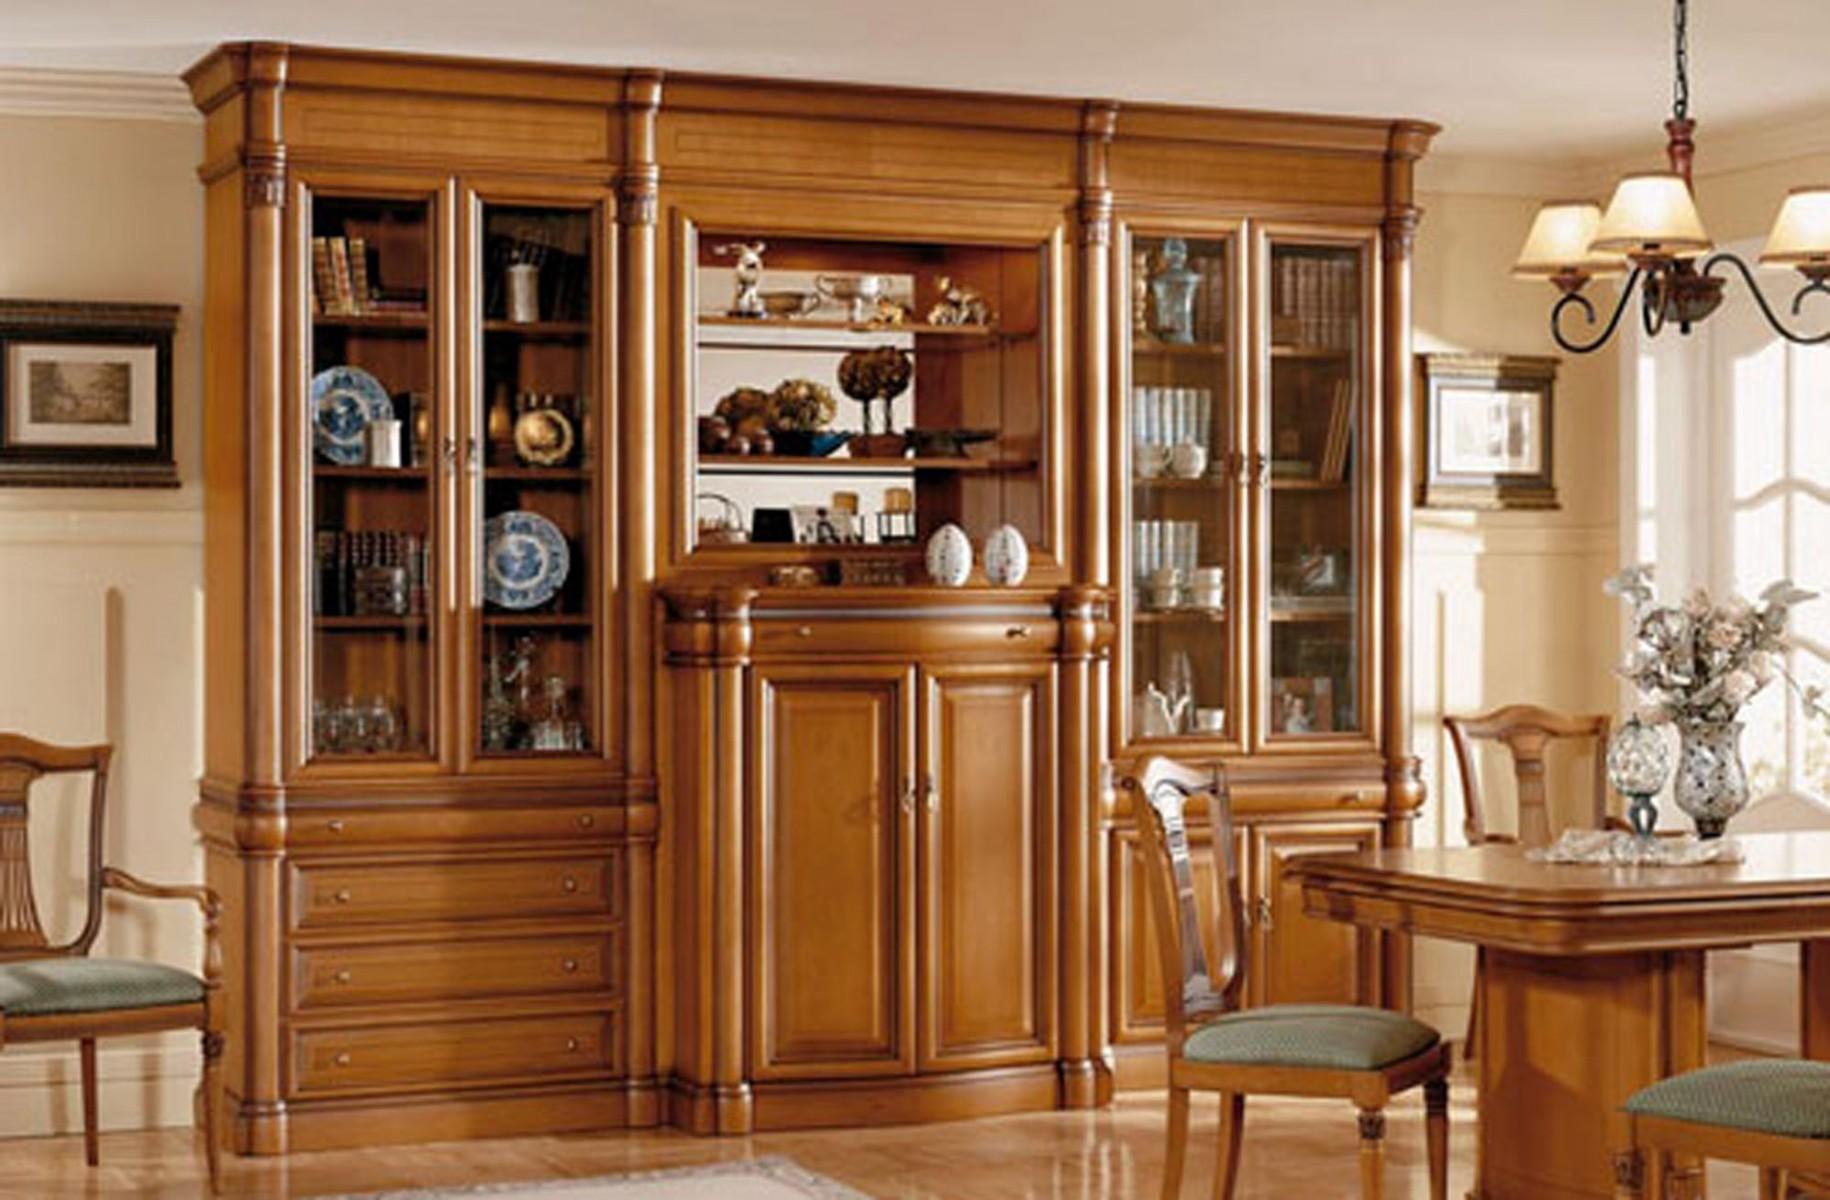 Mueble comedor clasico boisserie muebles valencia - Mueble clasico valencia ...